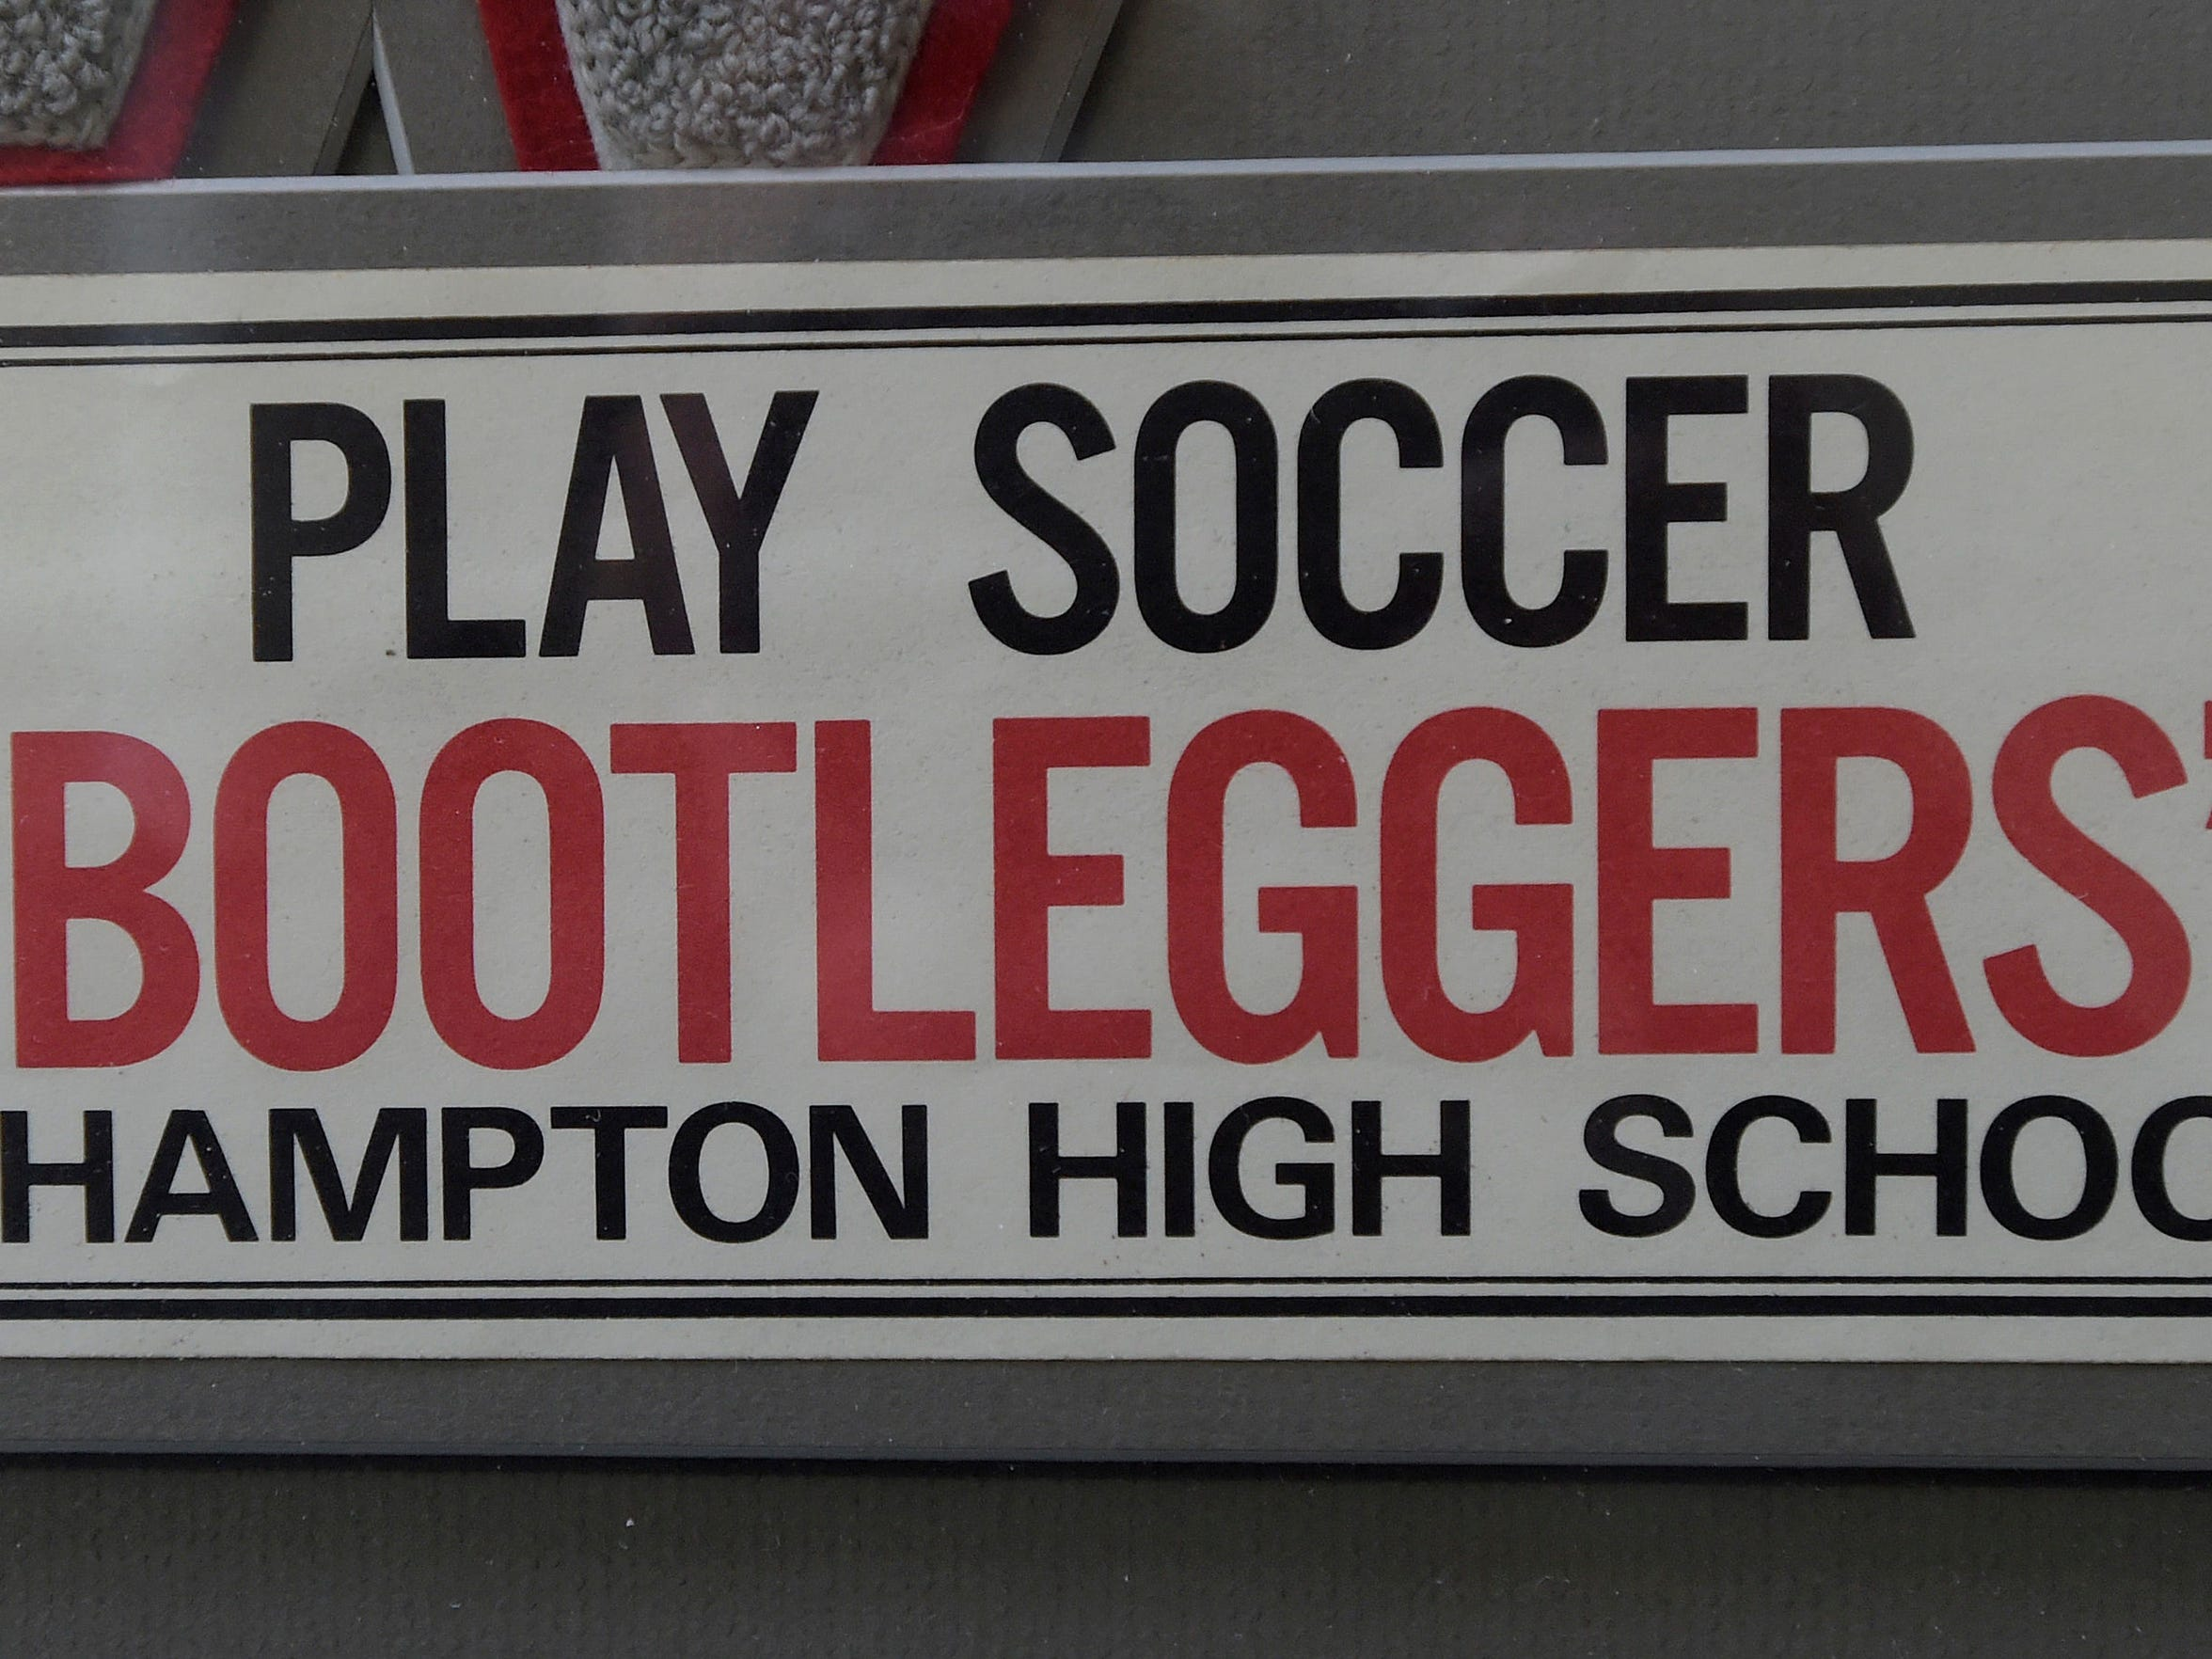 1974 Wade Hampton soccer bumper sticker with the team's